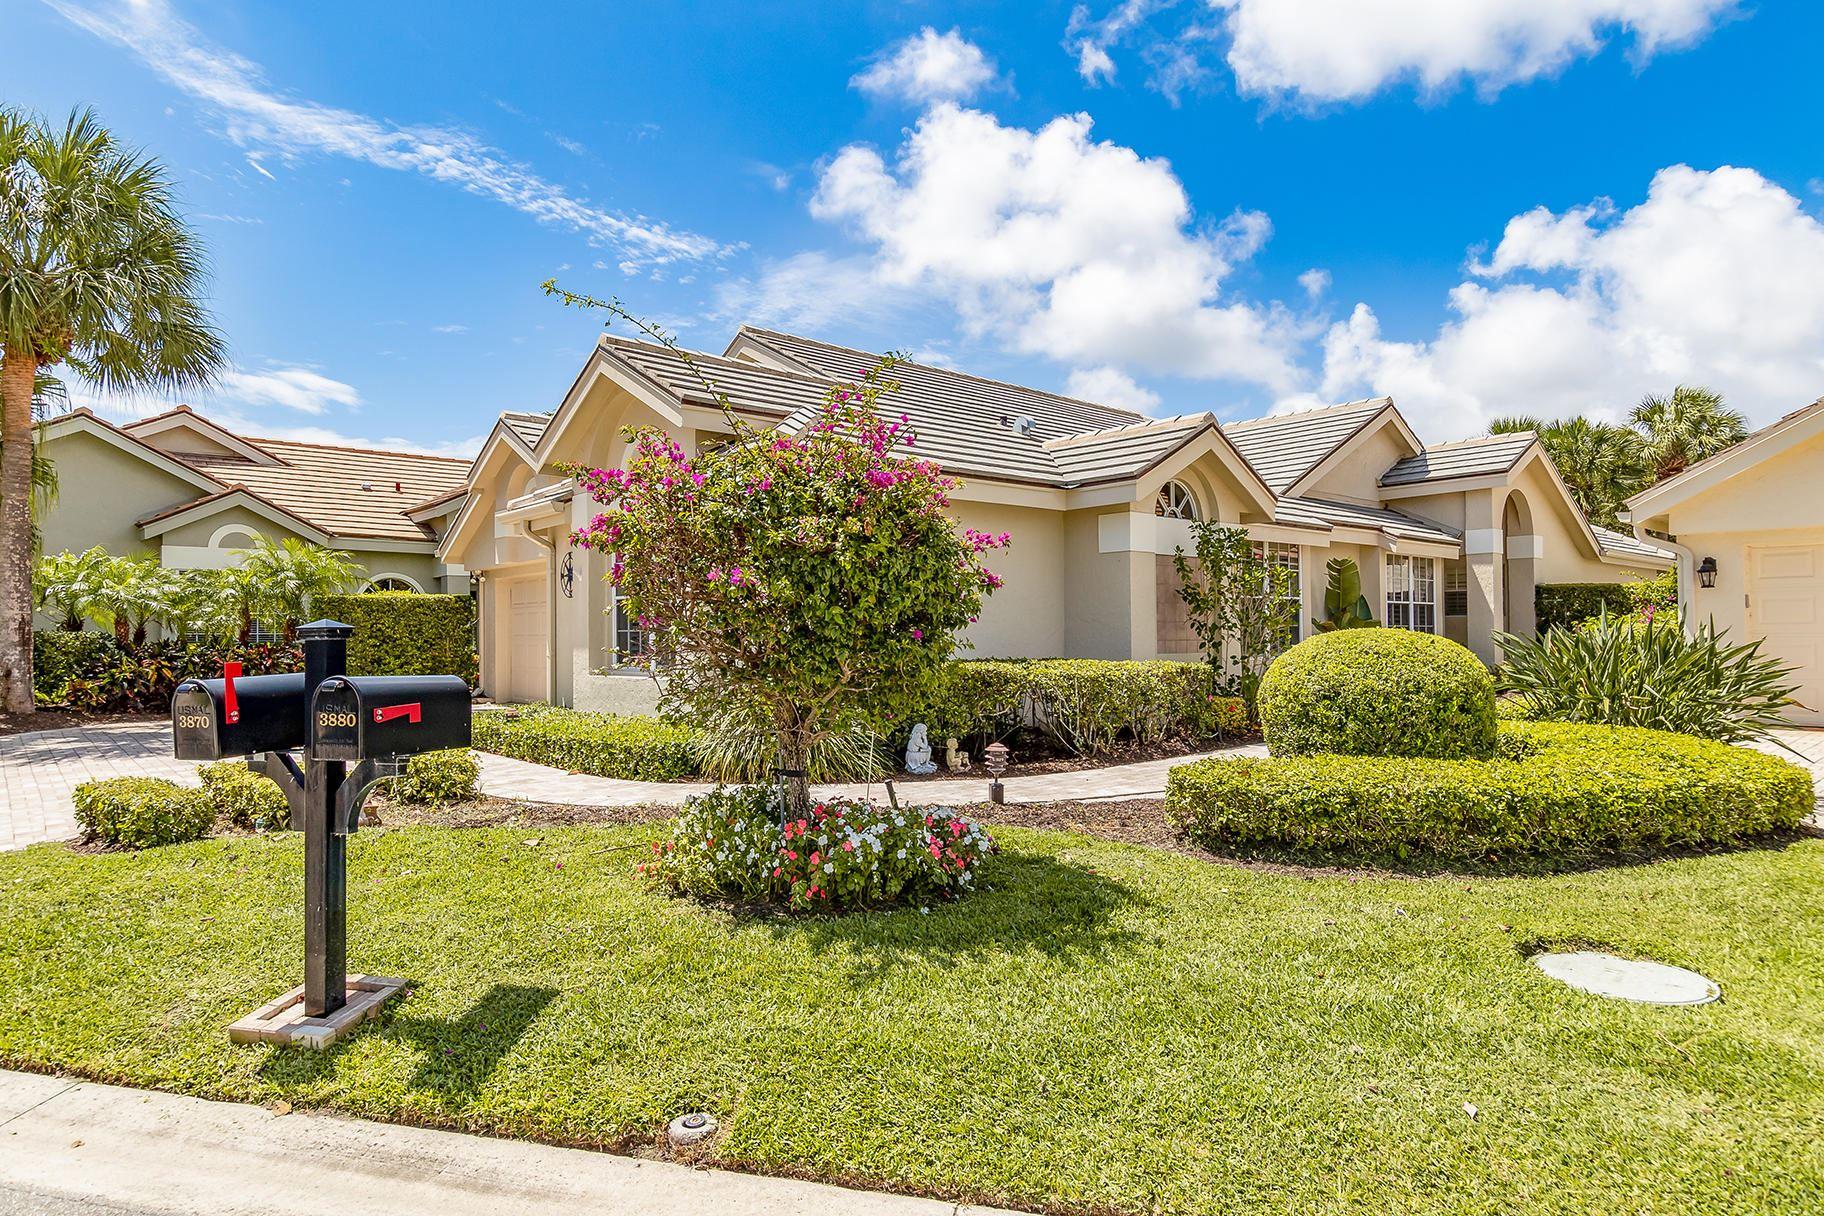 3870 Shearwater Drive, Jupiter, FL 33477 - #: RX-10625002